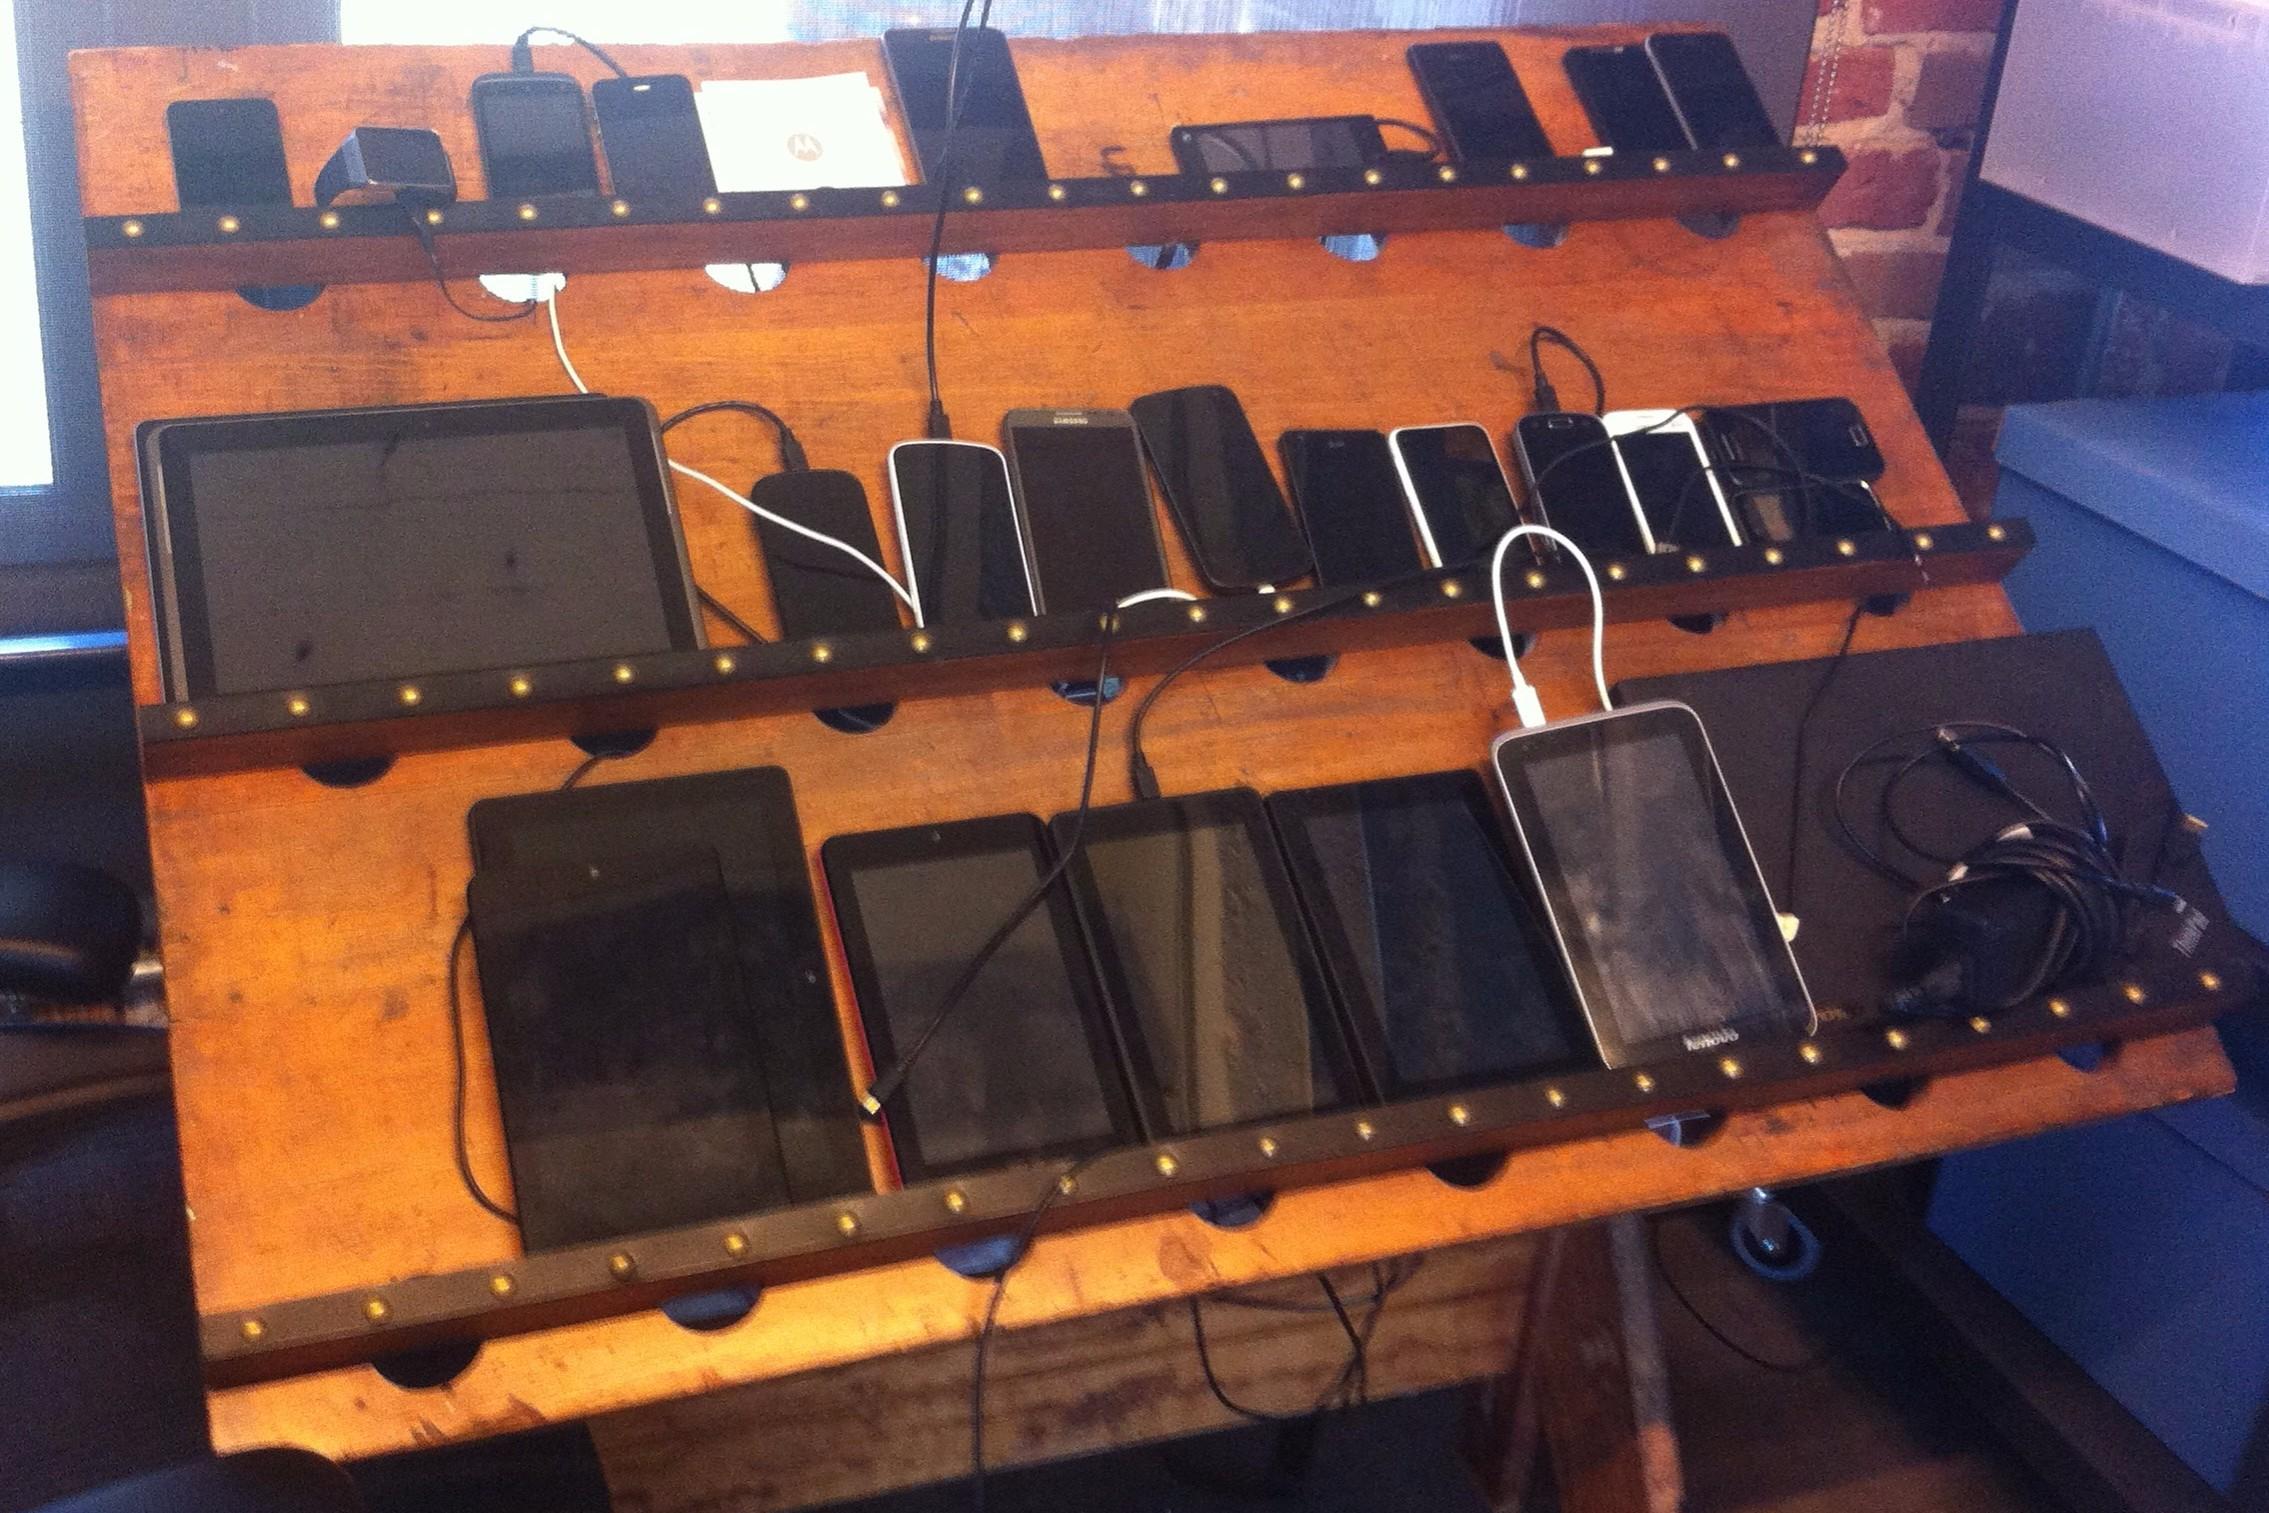 A device farm at Quip headquarters in San Francisco.